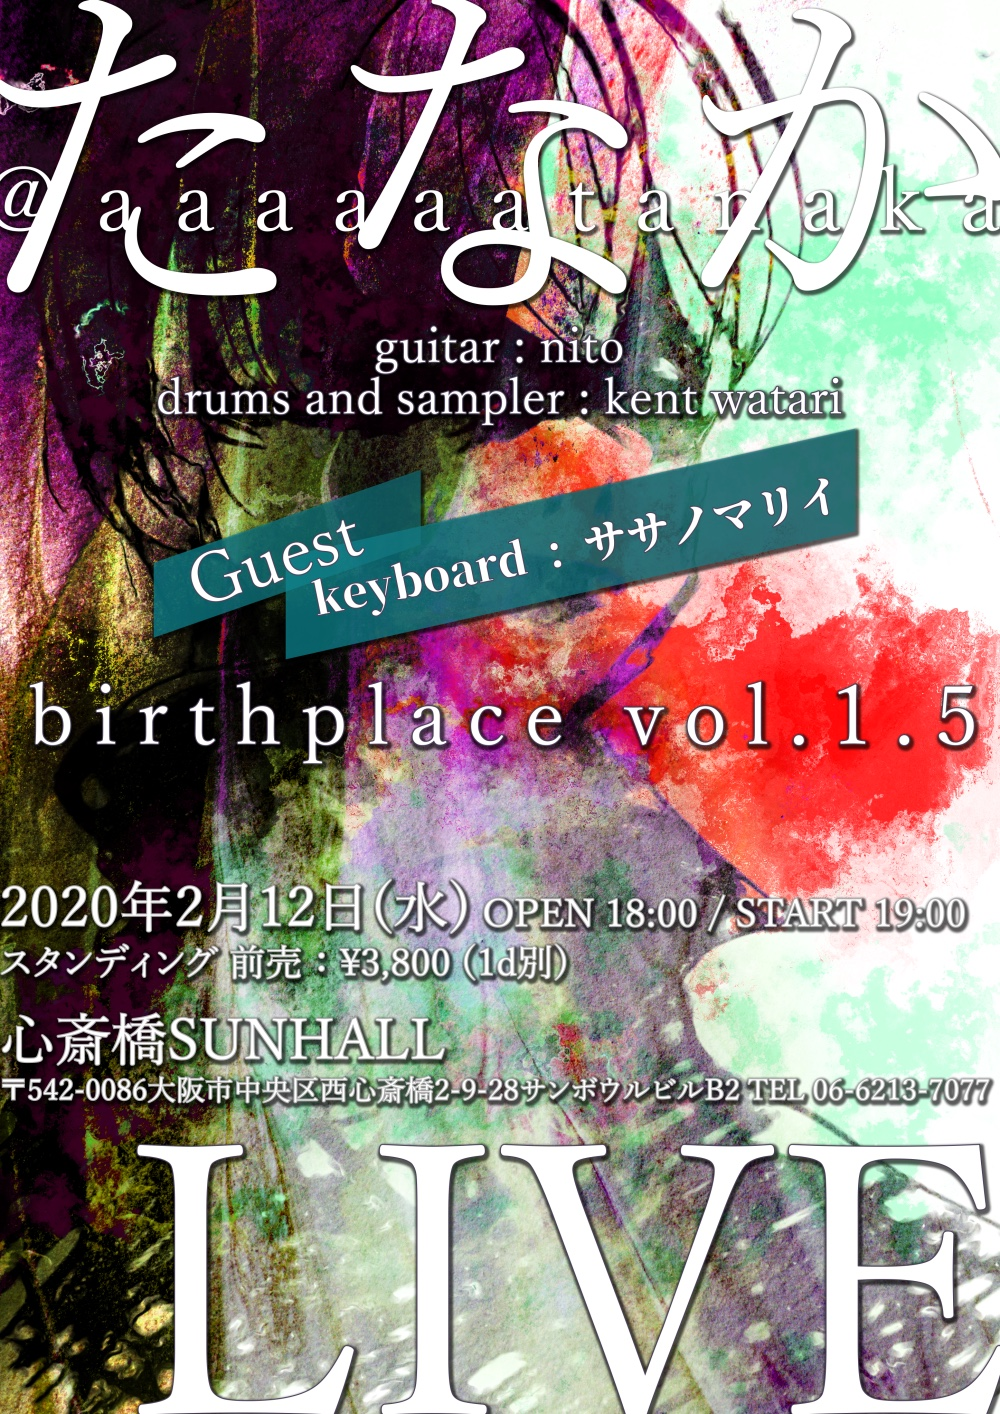 birthplace vol.1.5 大阪